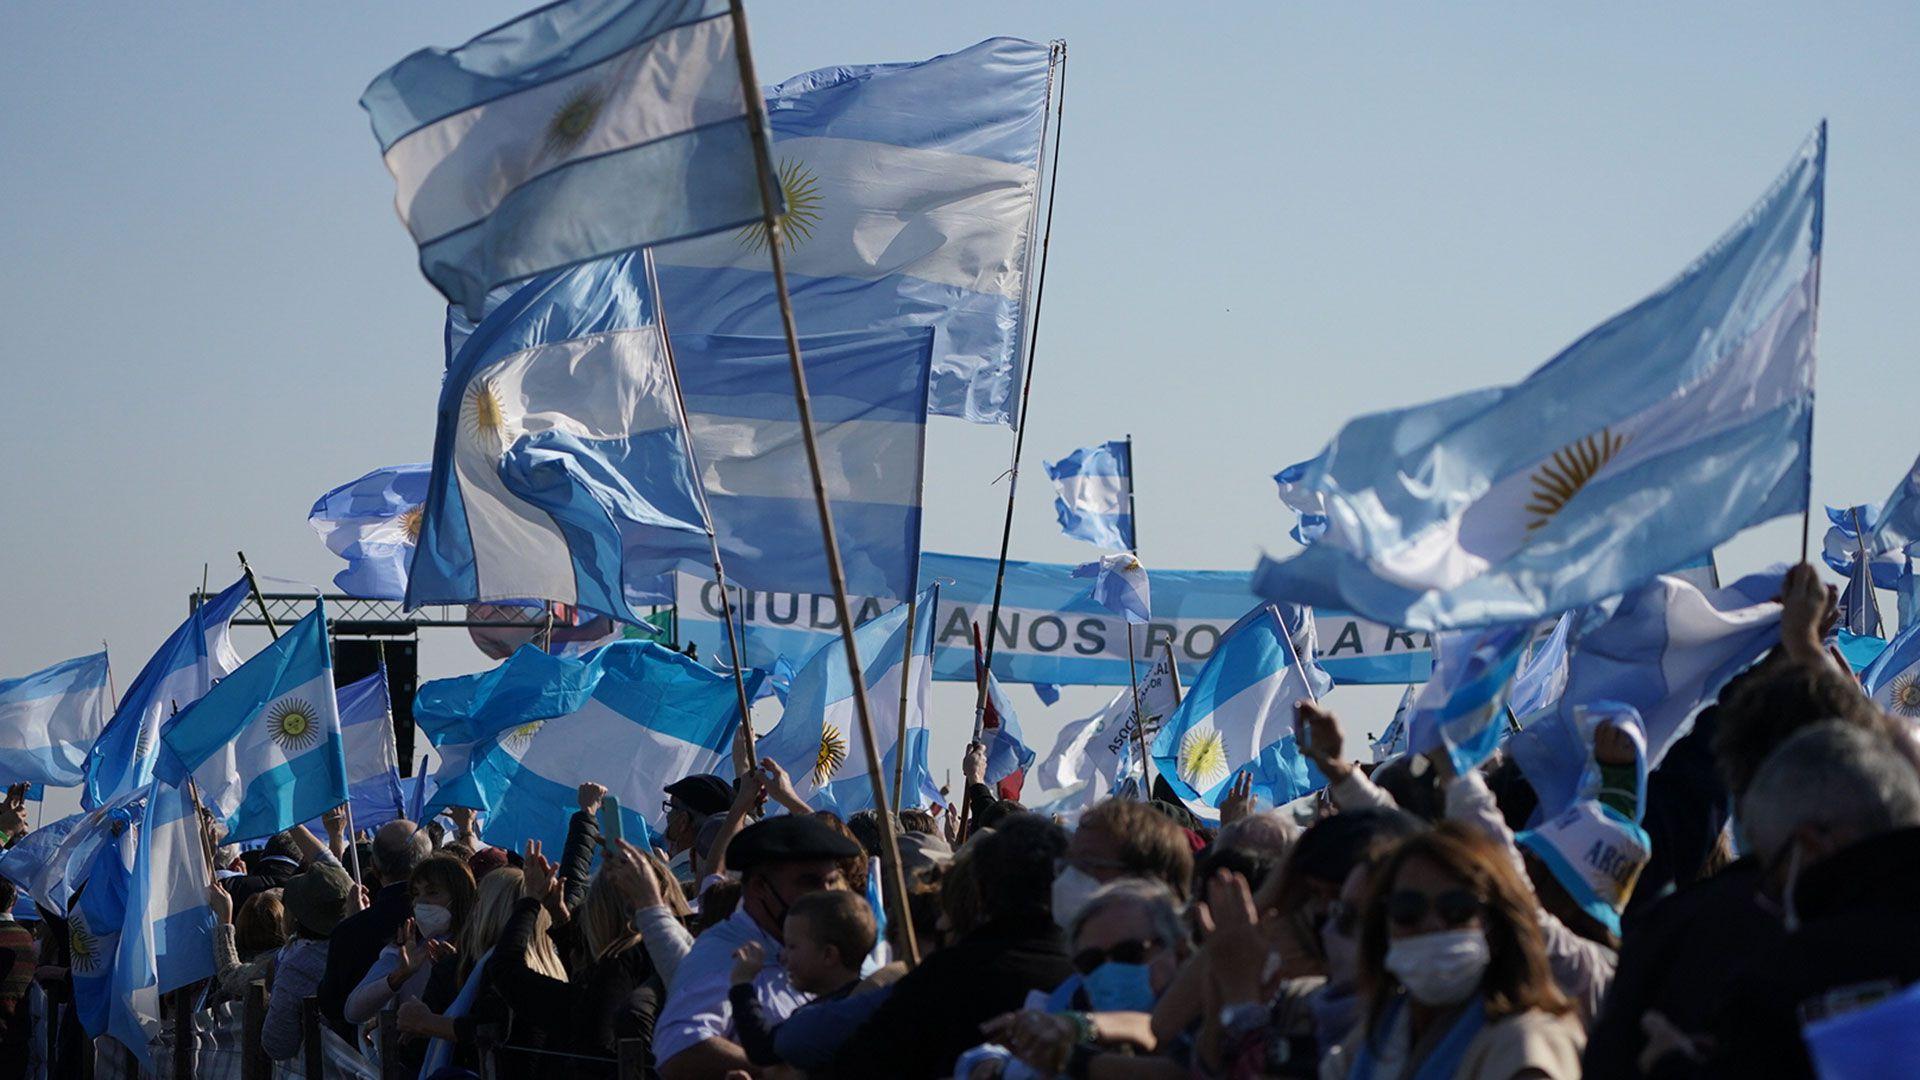 Protesta - marcha - caballo - san nicolas - 9 de julio - campo